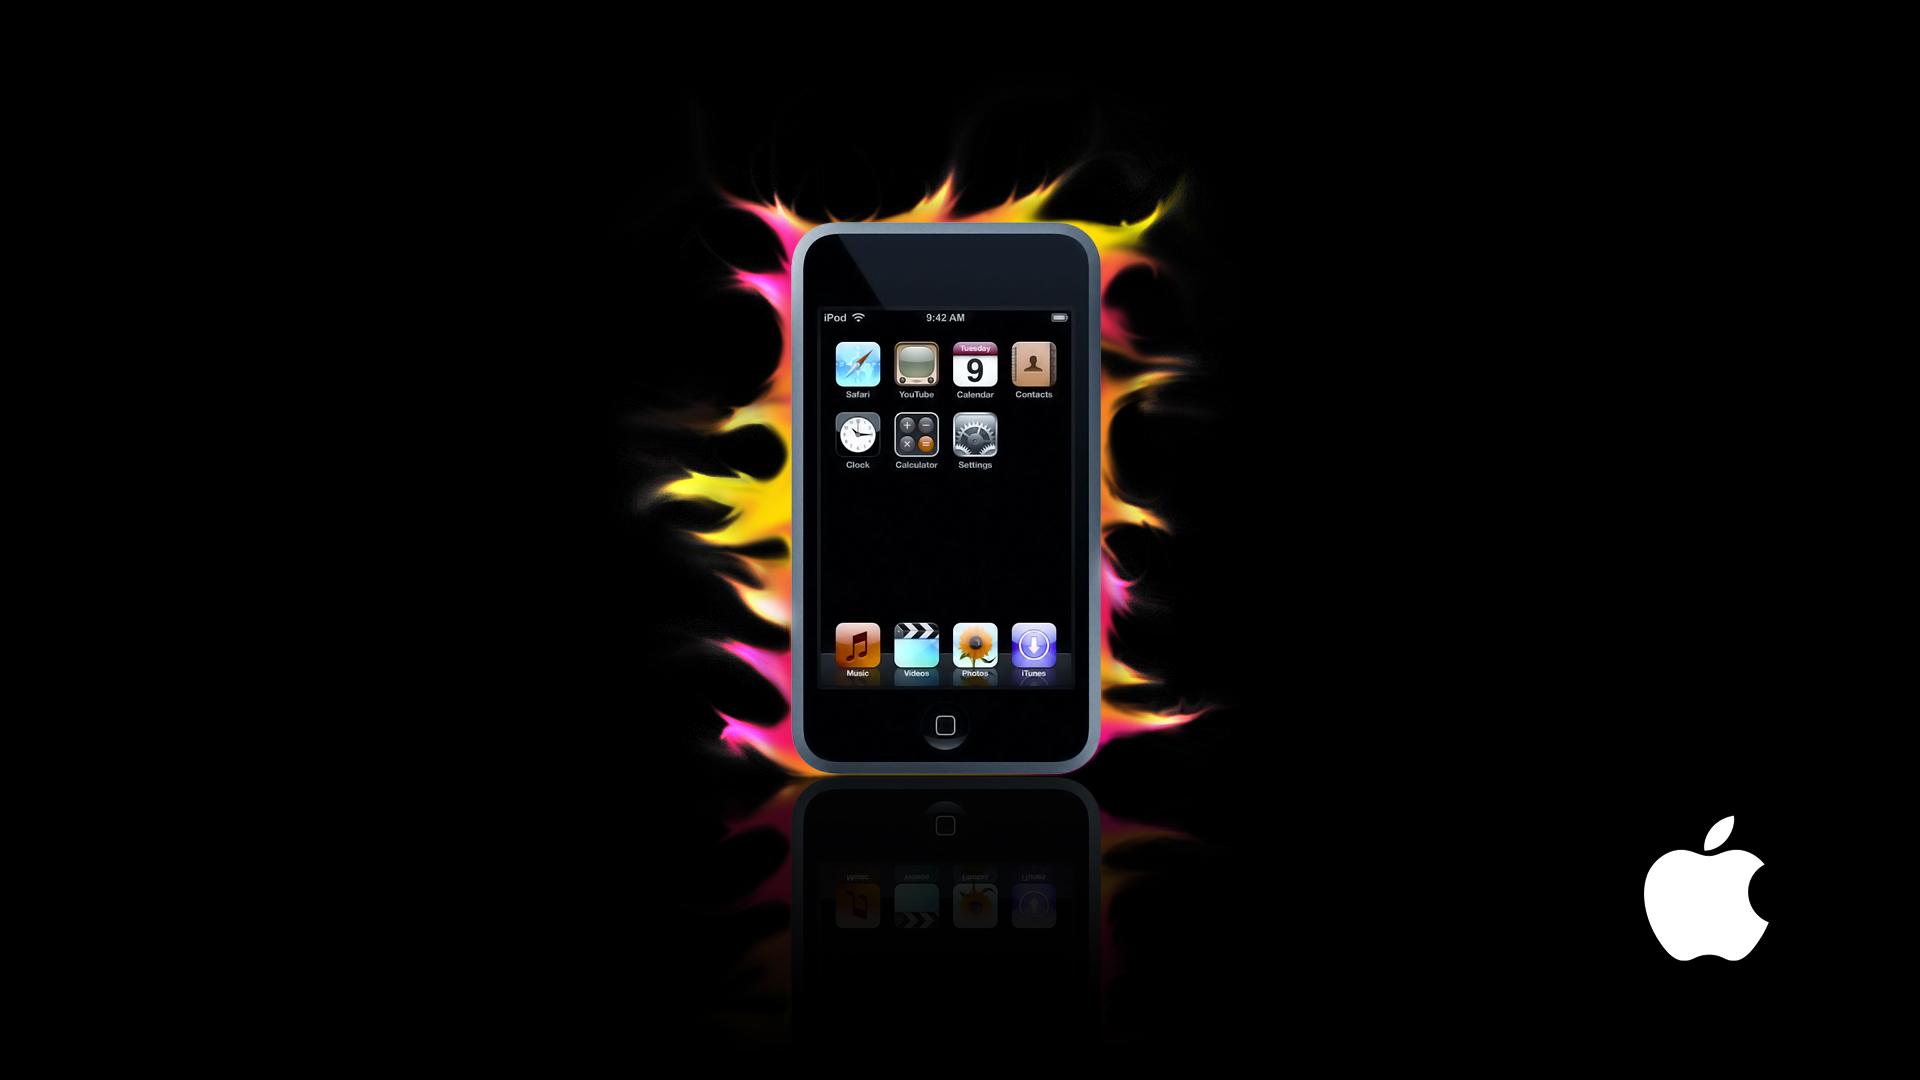 iPod Touch Wallpapers WallpaperSafari